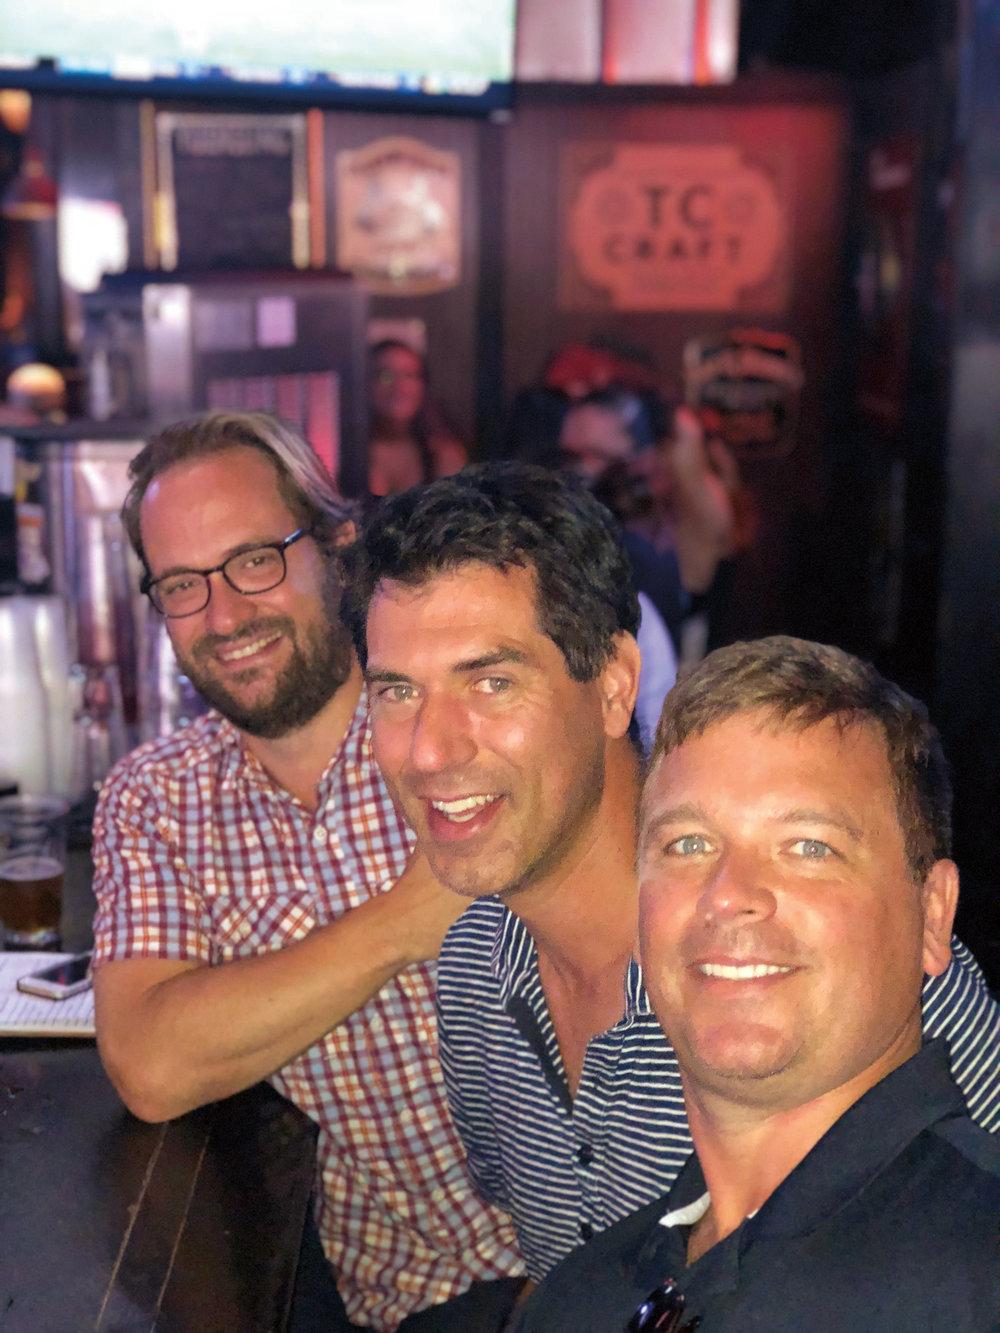 (L. to r.) Charles Finlay '94, Andrew Fagenholz '94, and Gunner Blackmore '94 met up in Nashville, Tenn.